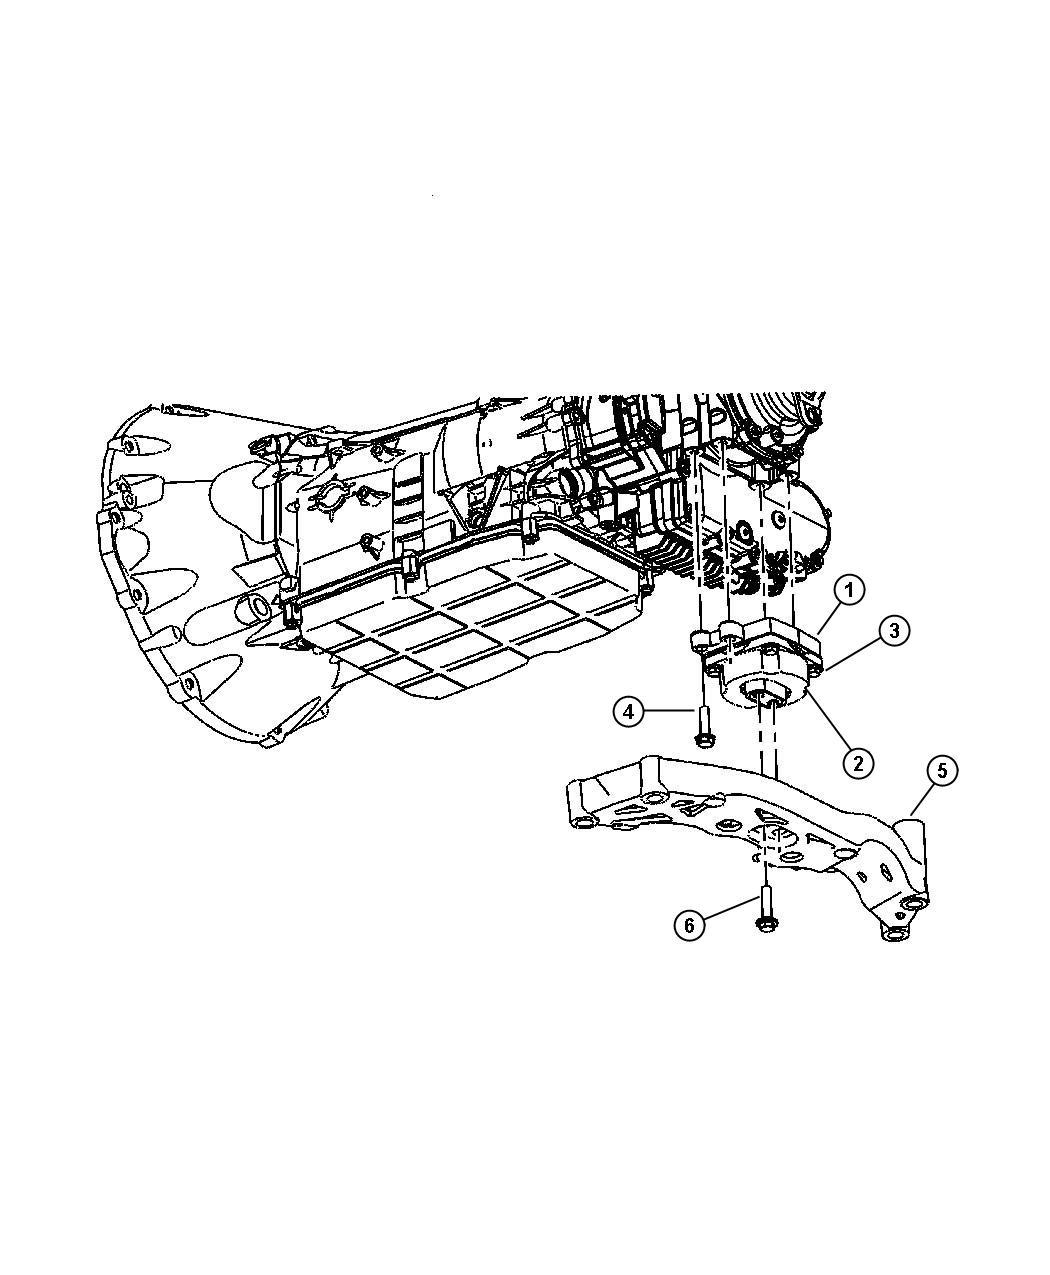 Chrysler 300 Mount Transmission